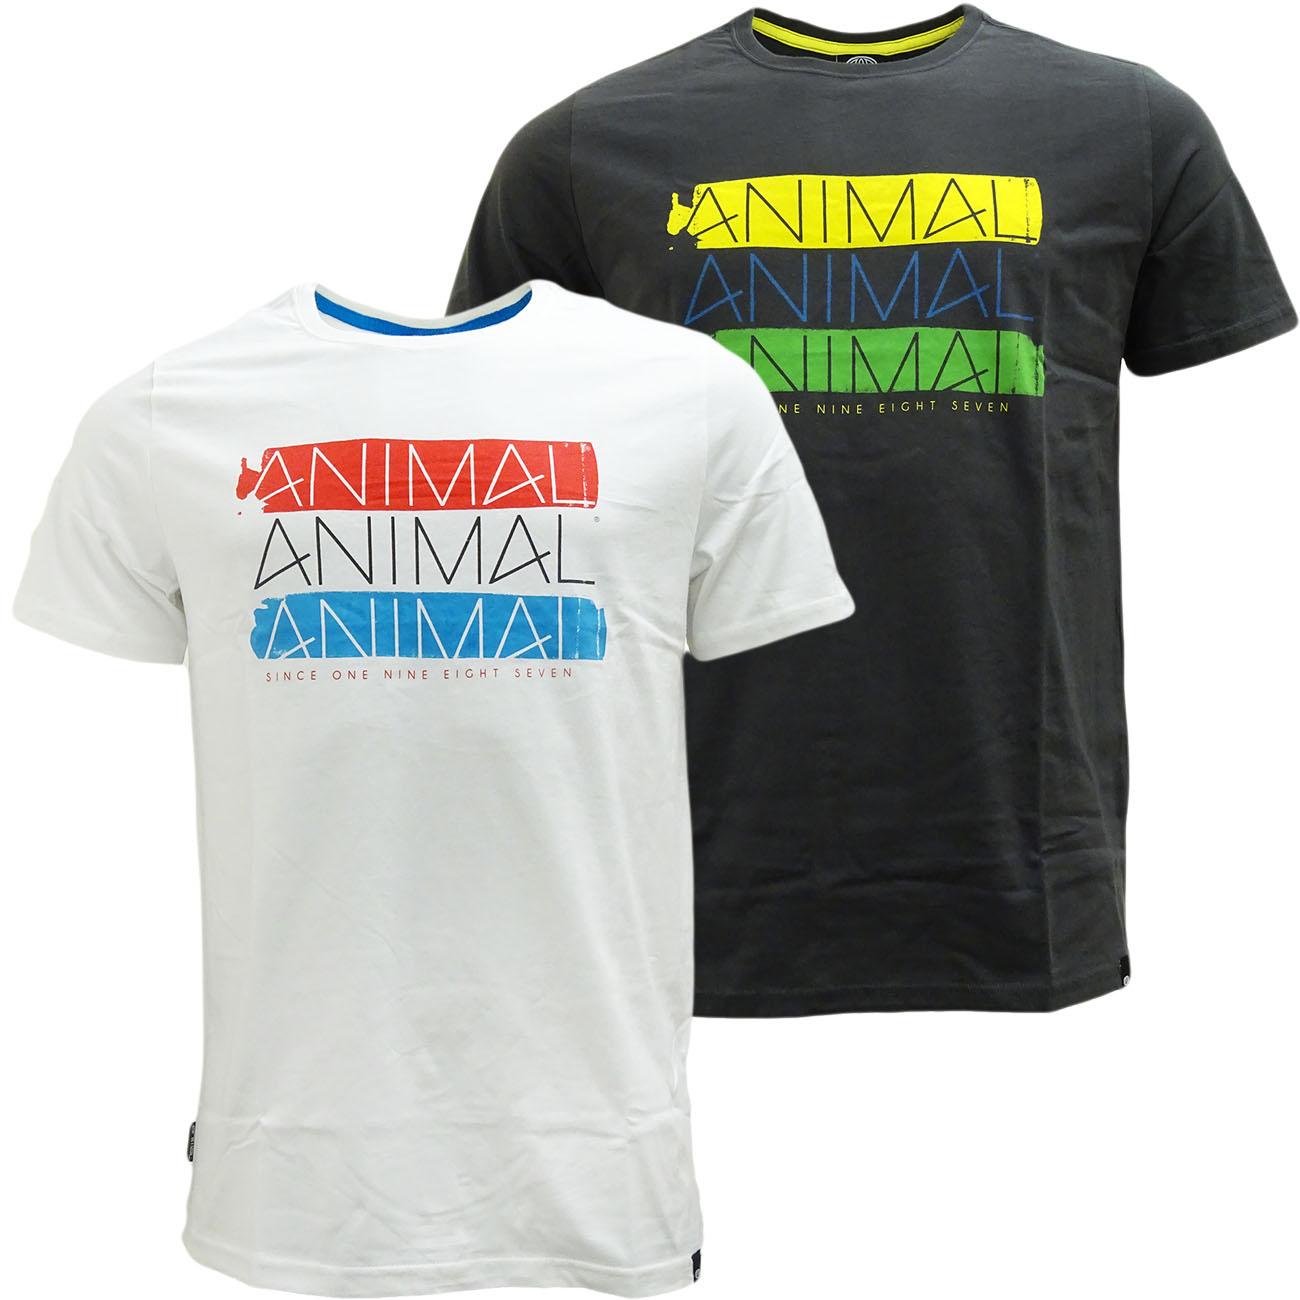 Animal T Shirt - Short Sleeve Custom Fit T-Shirts by Animal